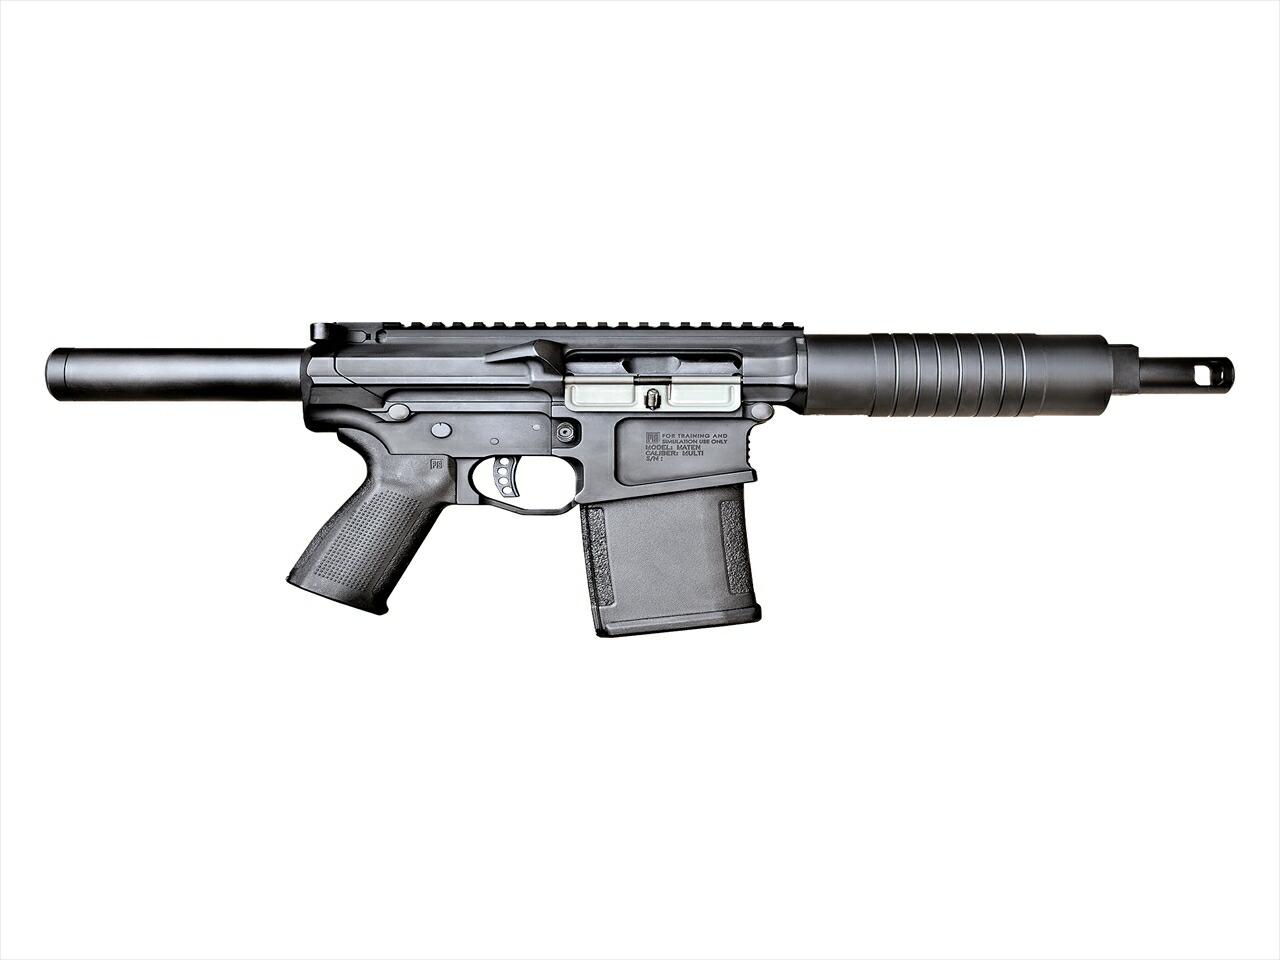 KSC マテン ピストル MATEN .308ピストル ガスガン サバゲー エアガン 銃 害獣駆除 18歳以上 限定品 新品